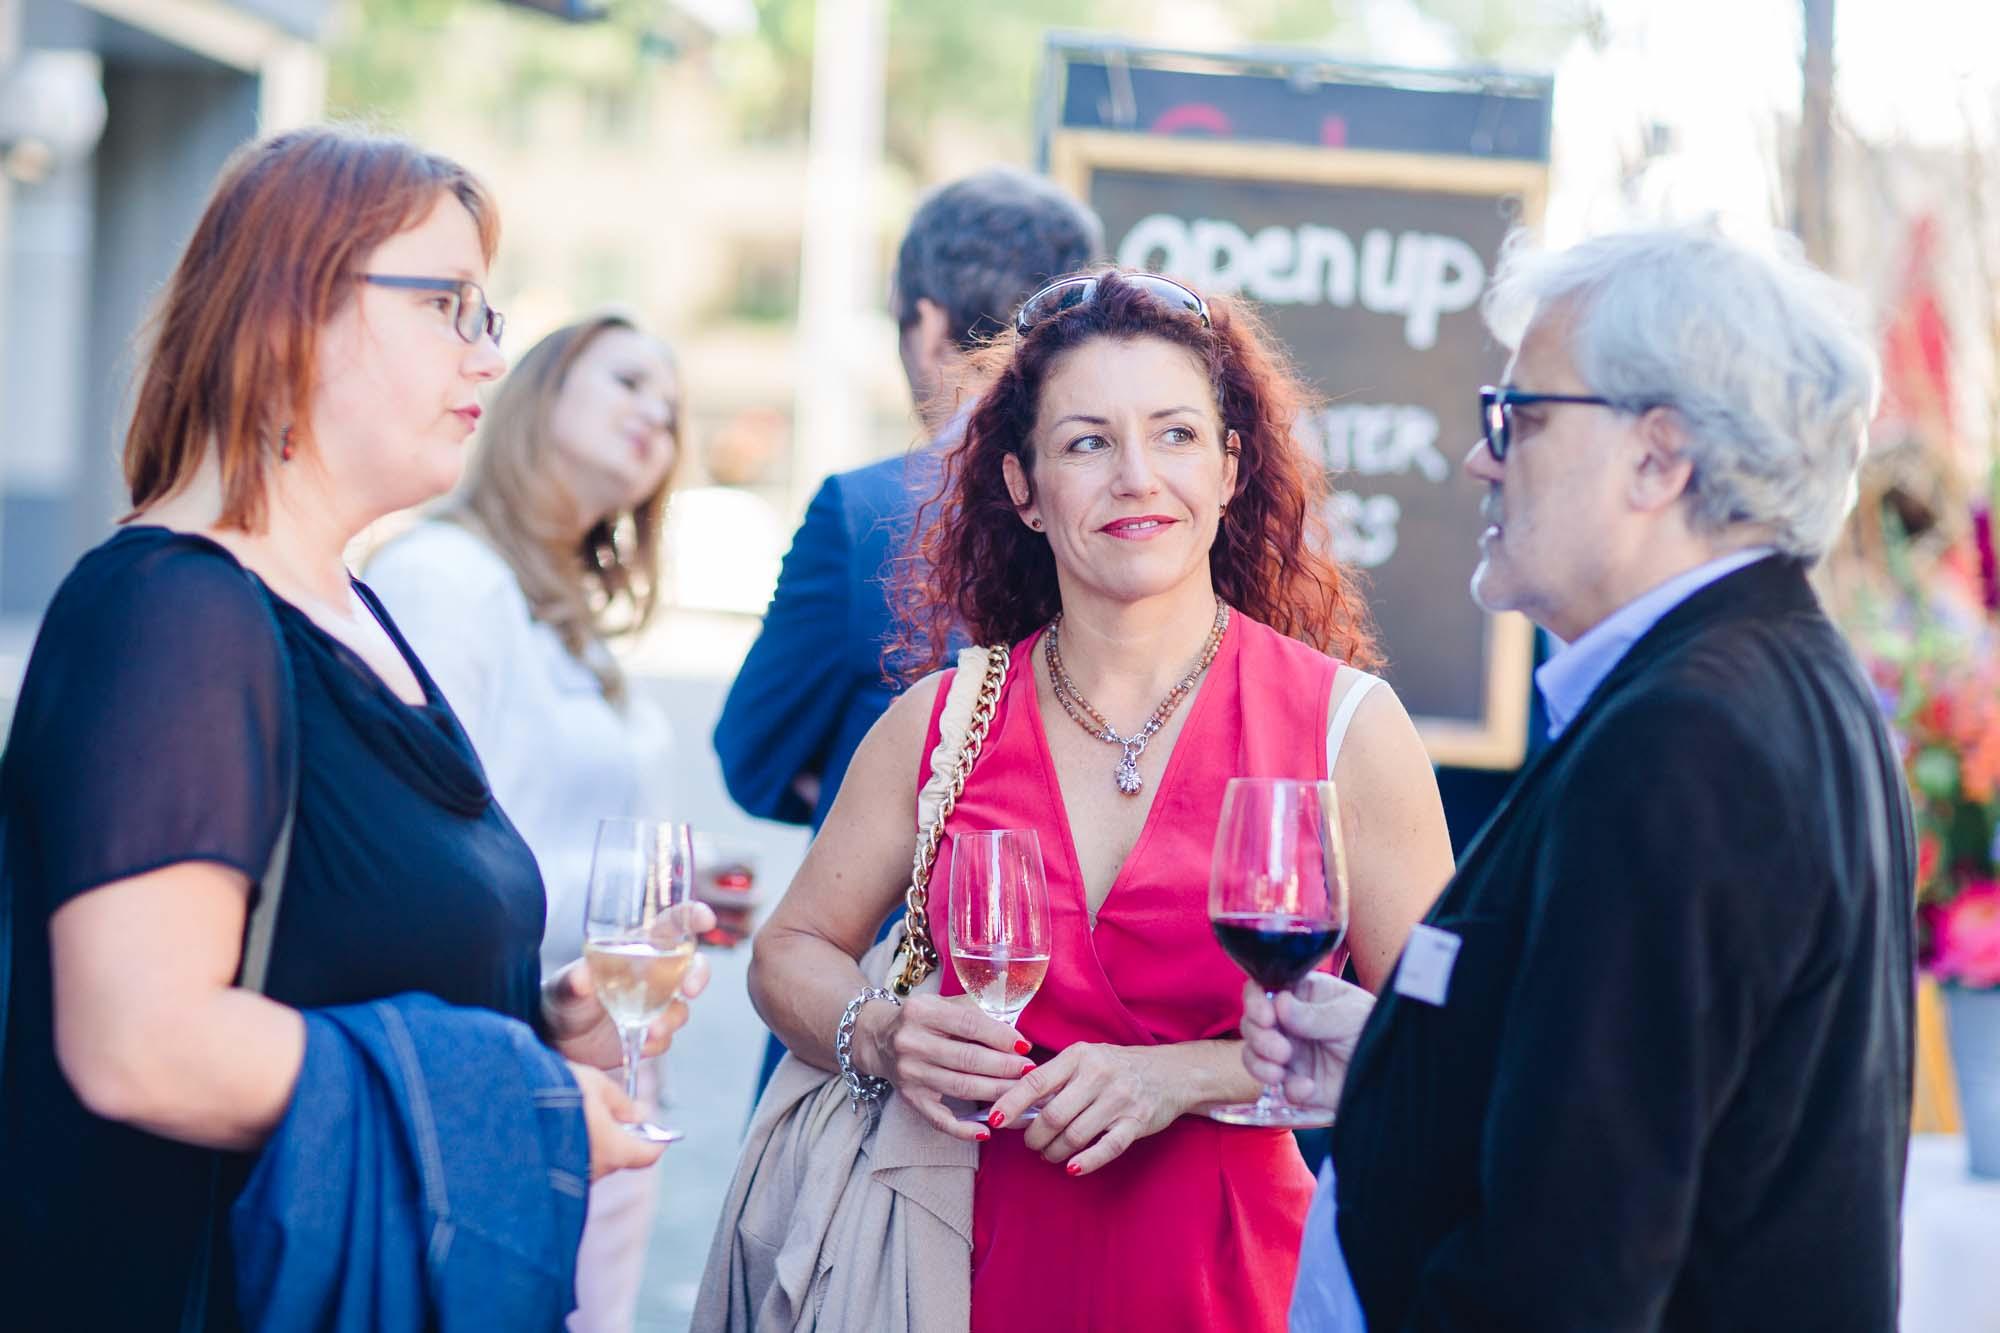 Gisela Milesi, Angela Grandjean and Urs Thaler